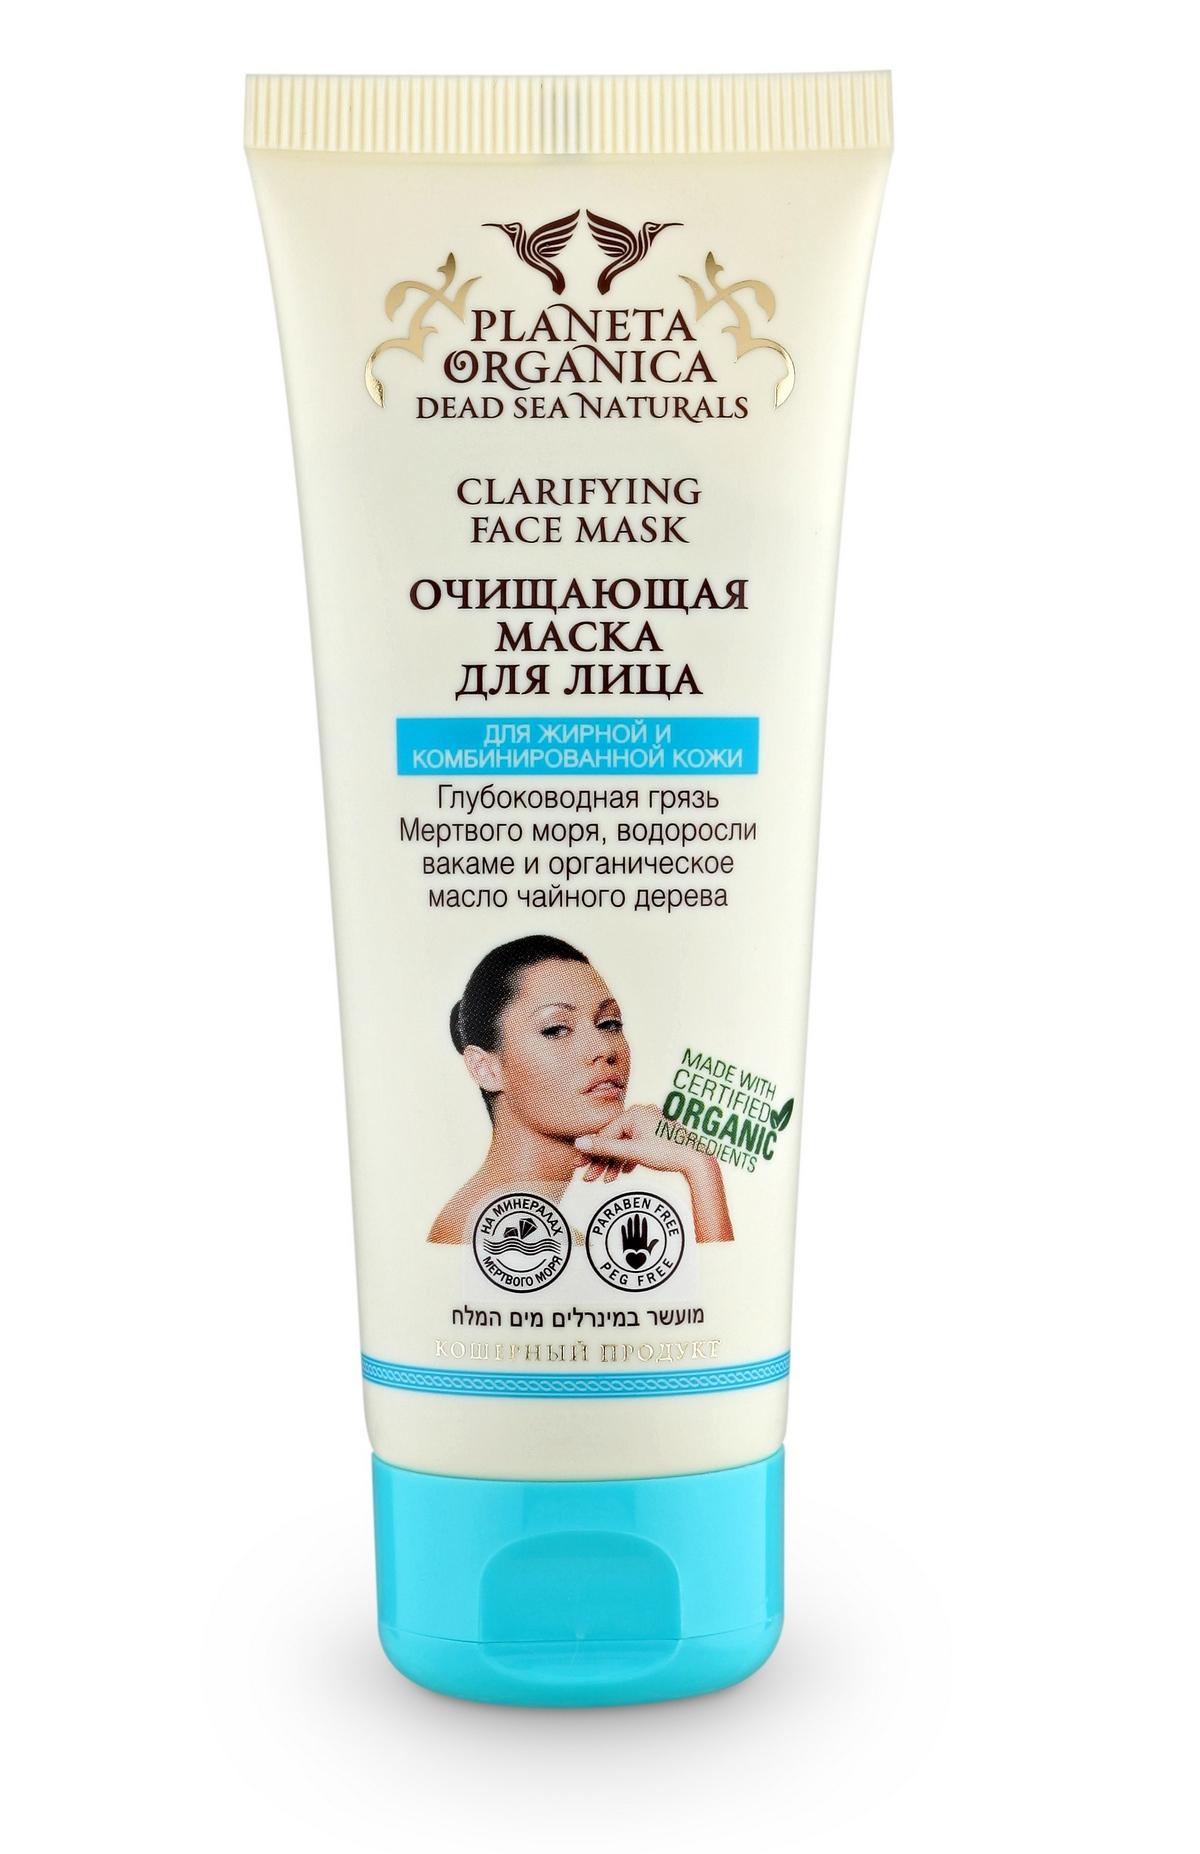 цена на Planeta organica Dead sea naturals, Маска для лица очищающая, 75 мл